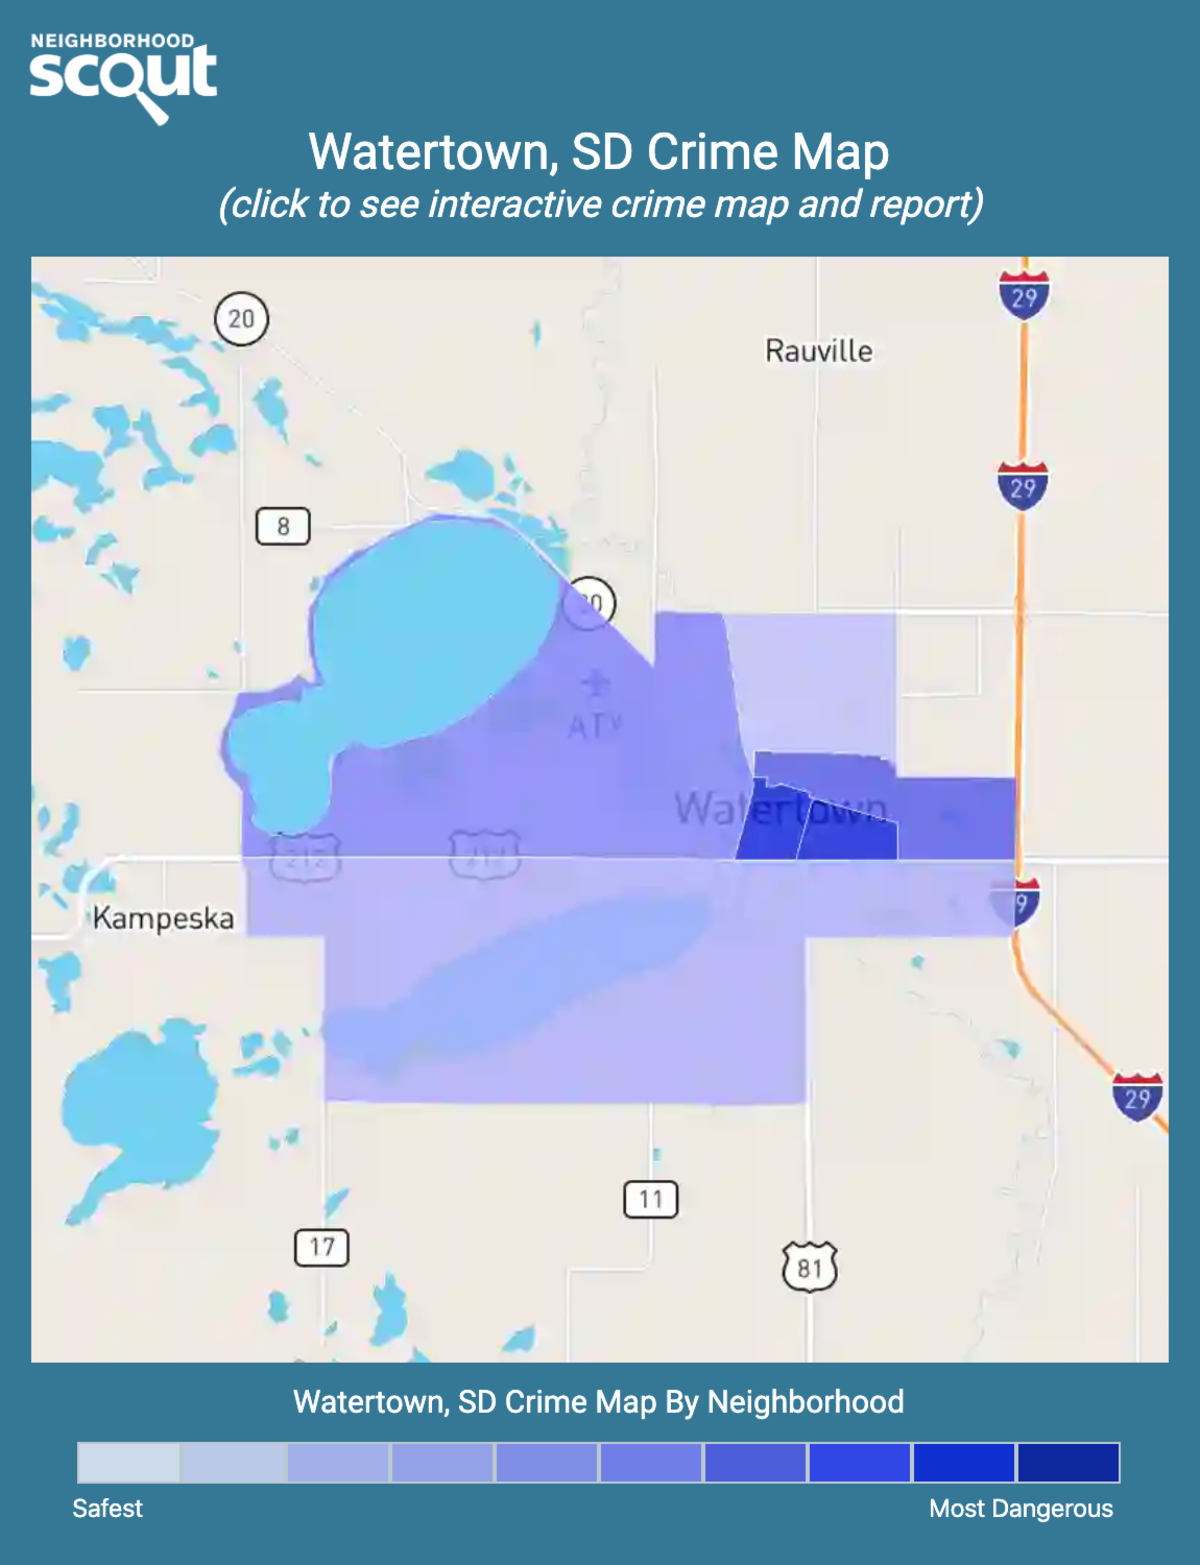 Watertown, South Dakota crime map